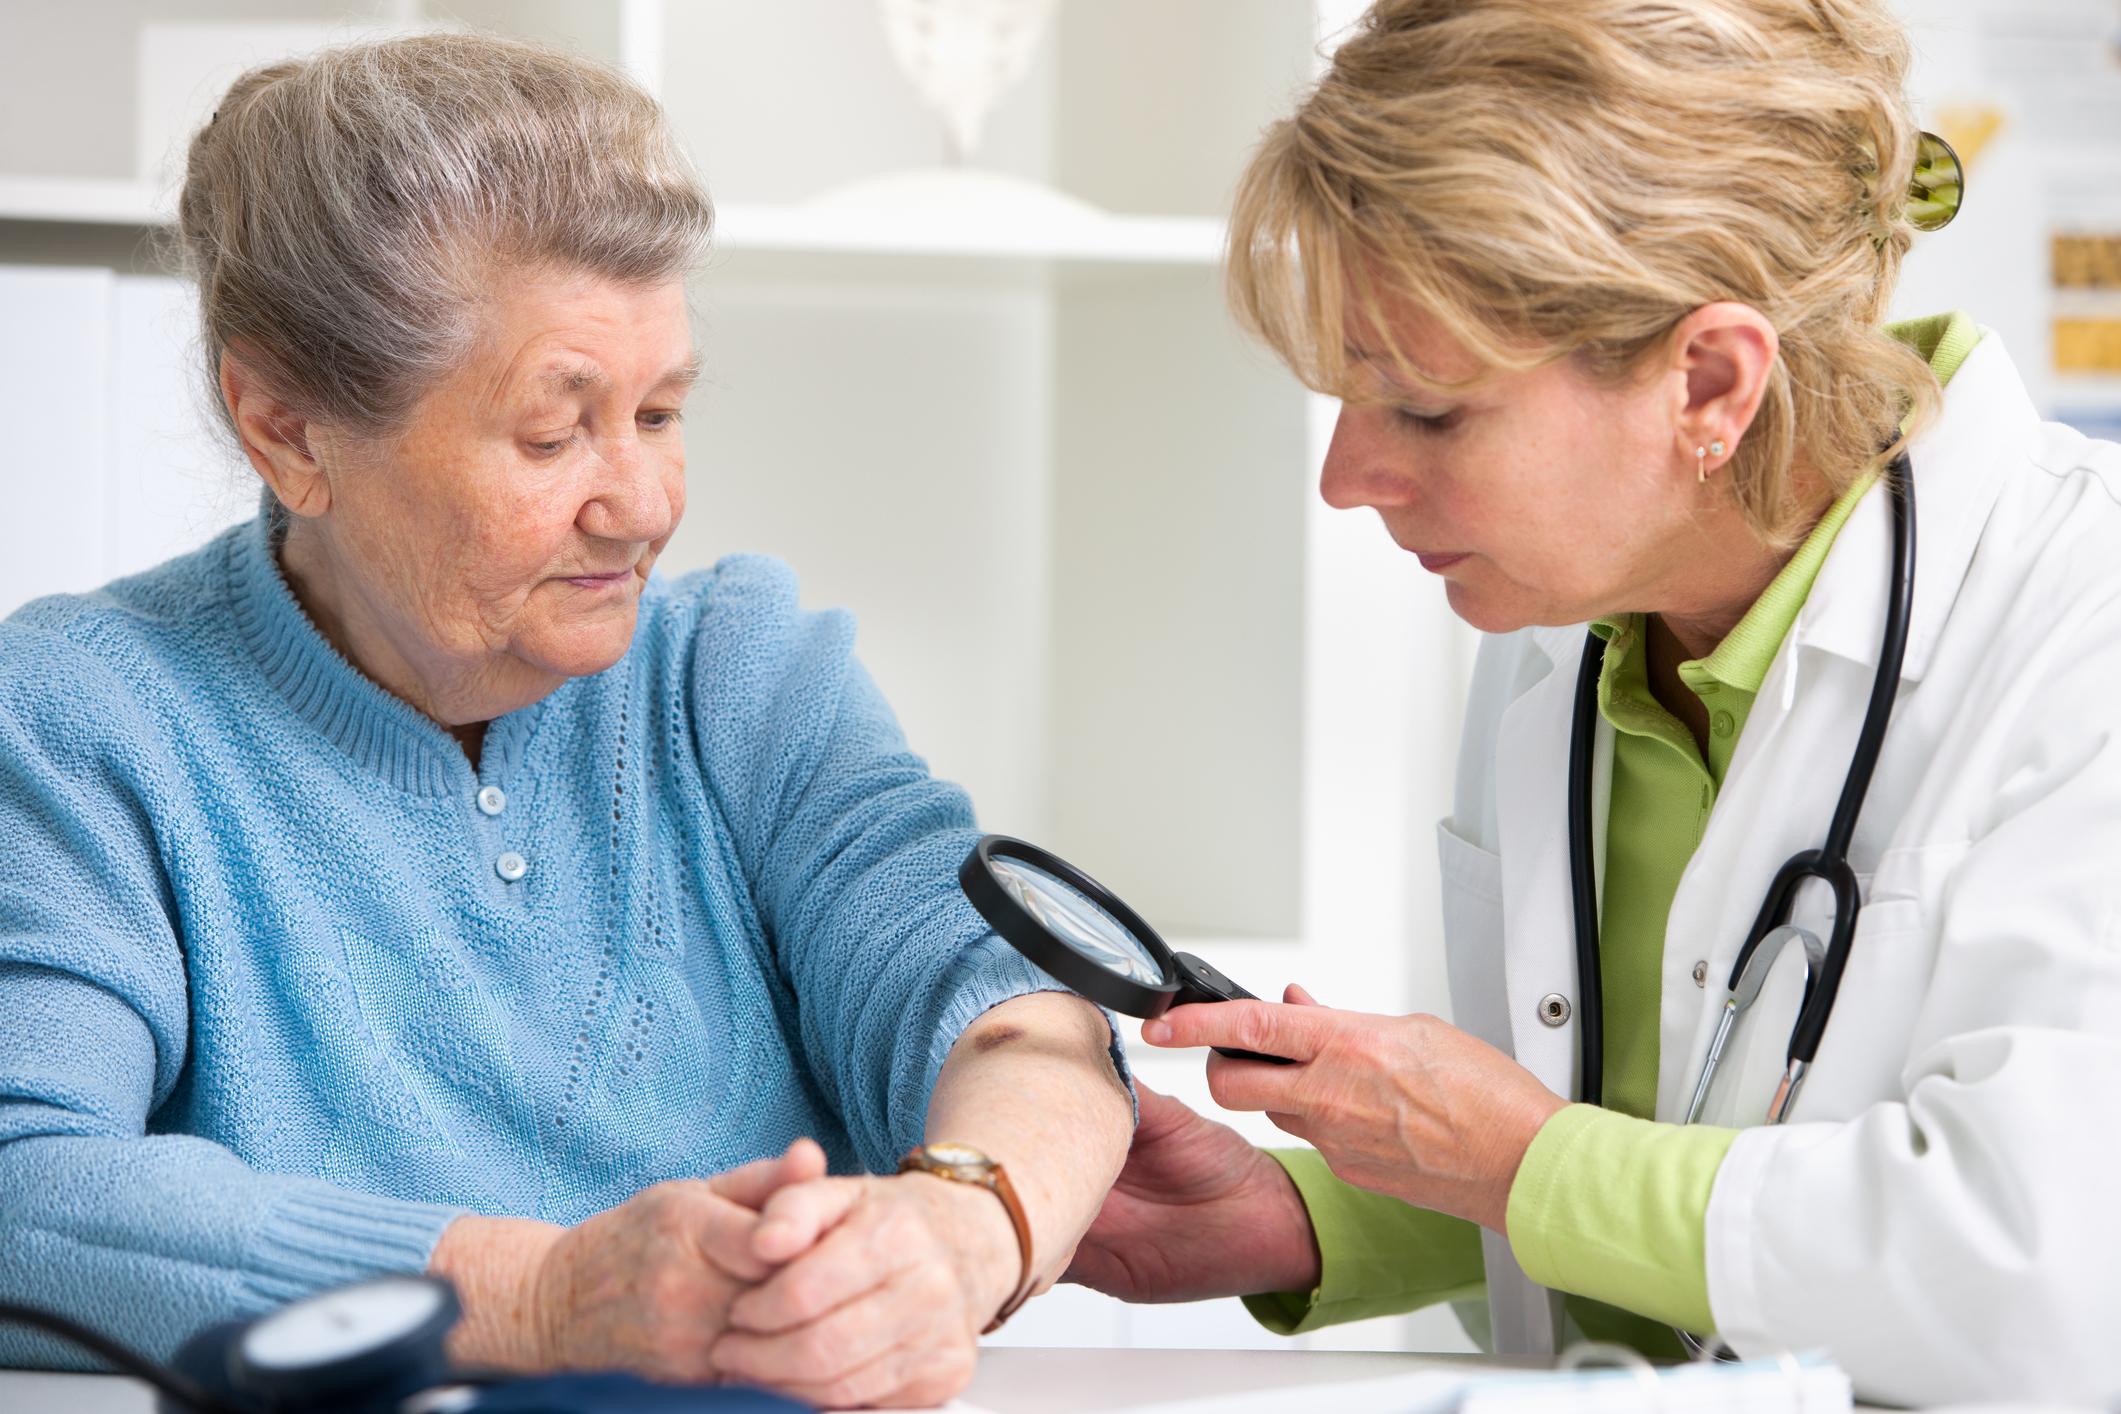 Dermatologist examining skin of an elderly patient.